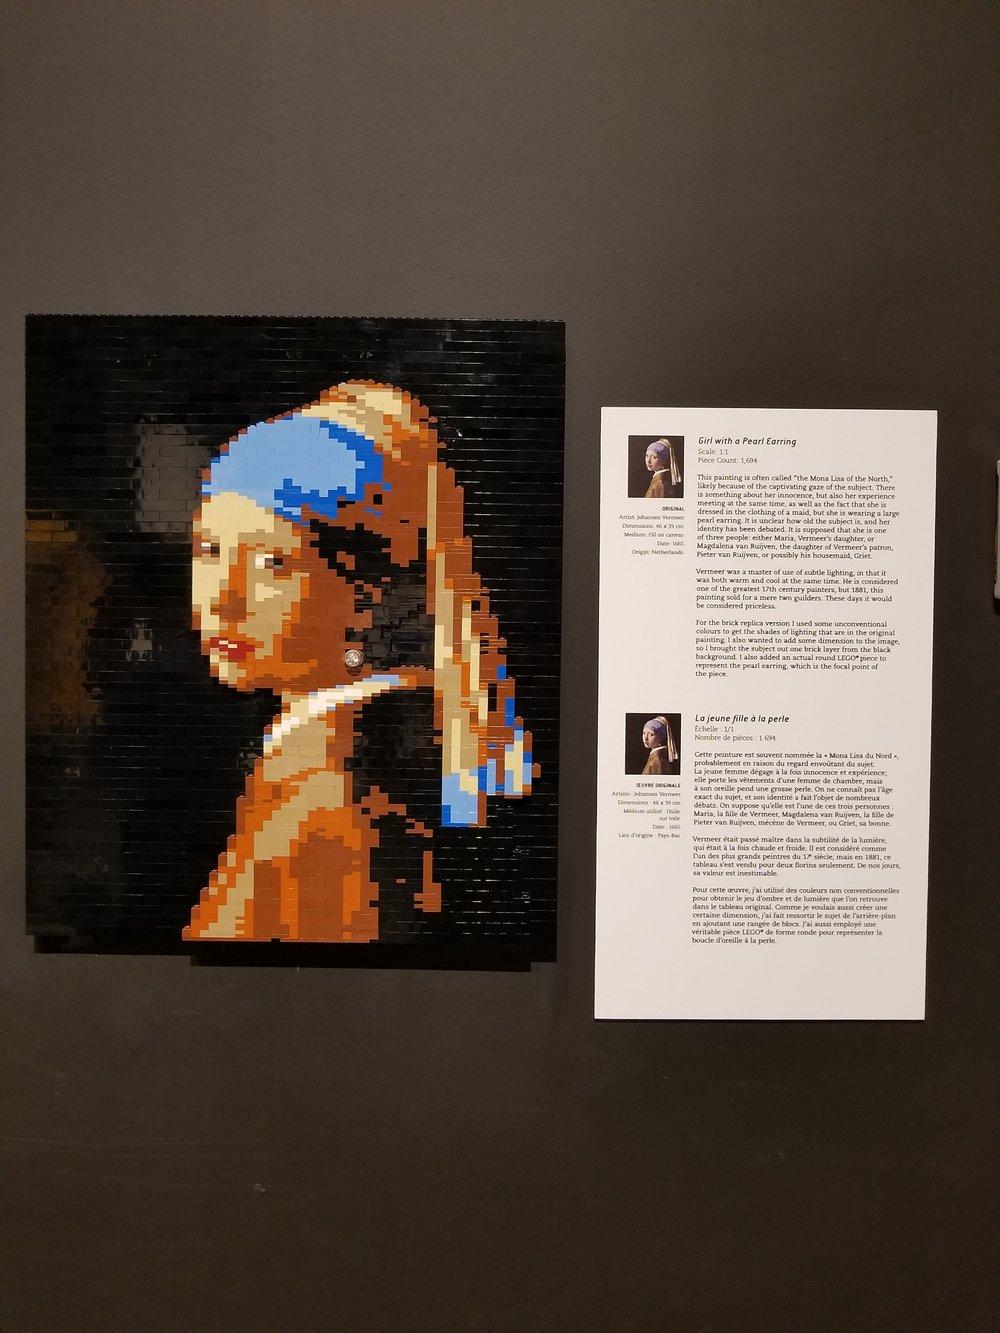 Girl with a Pearl Earring - Vermeer